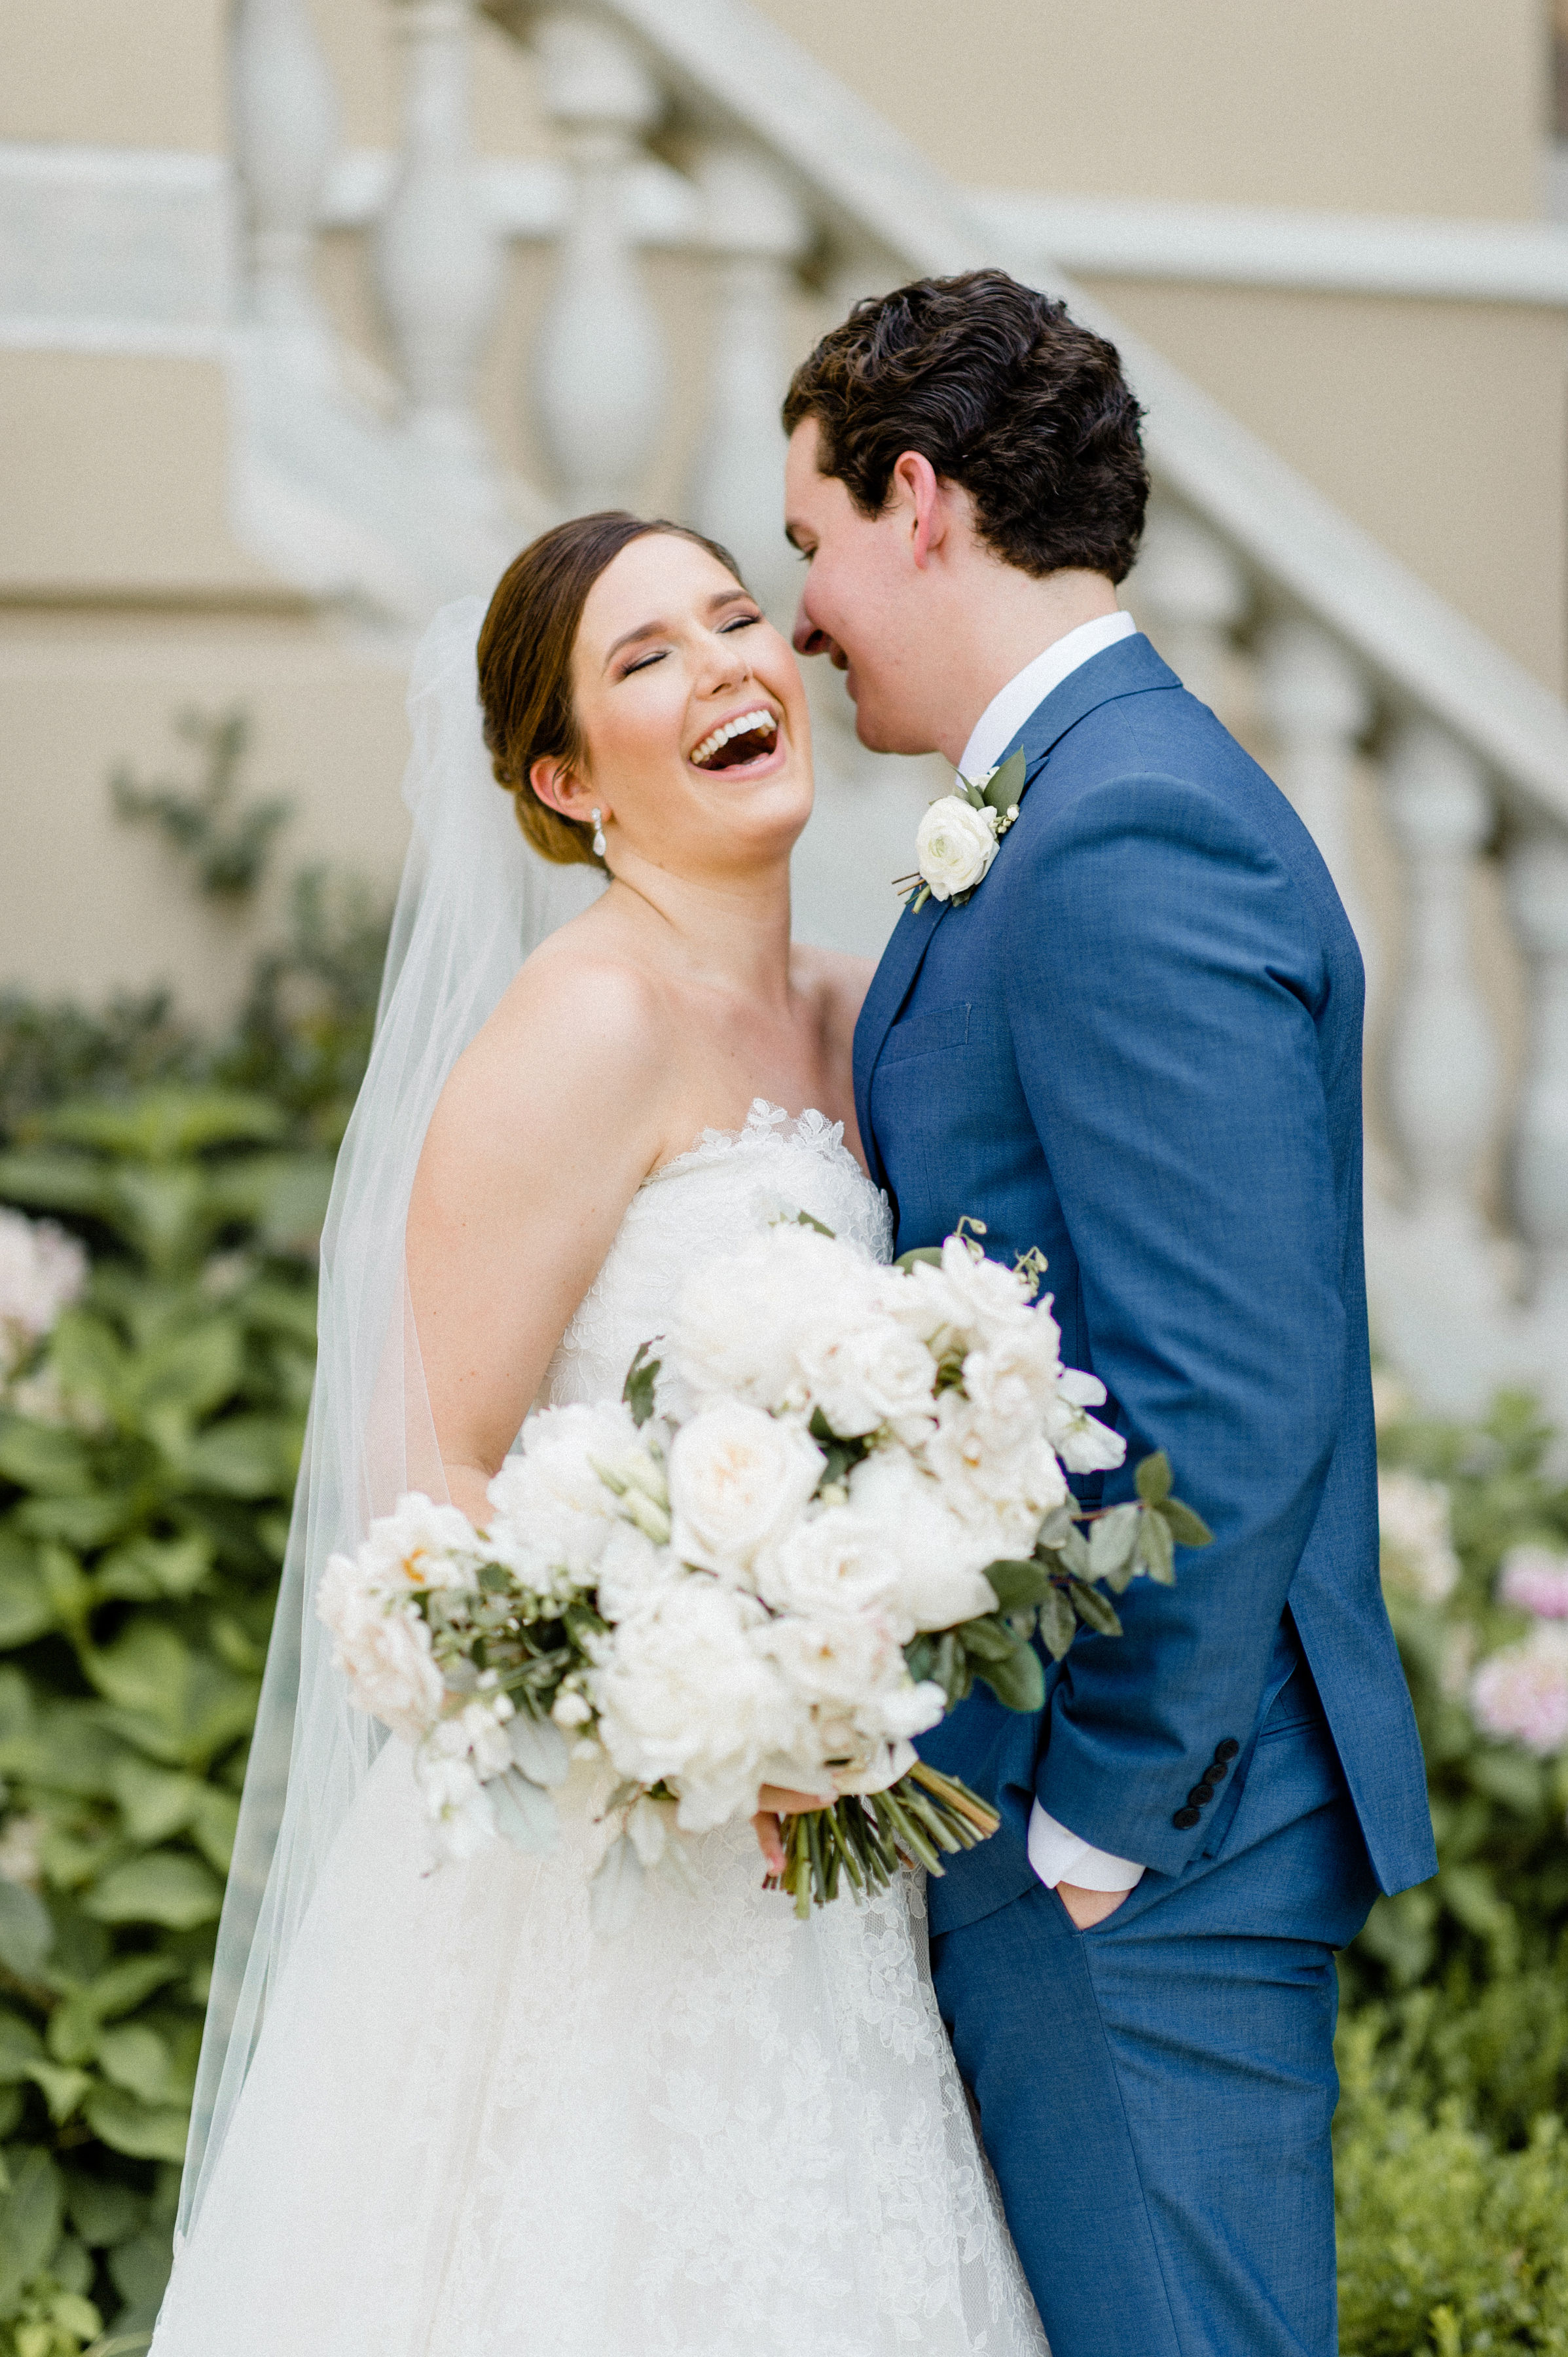 McElravey_Wedding_CarolineLimaPhotography_2018_210.jpg